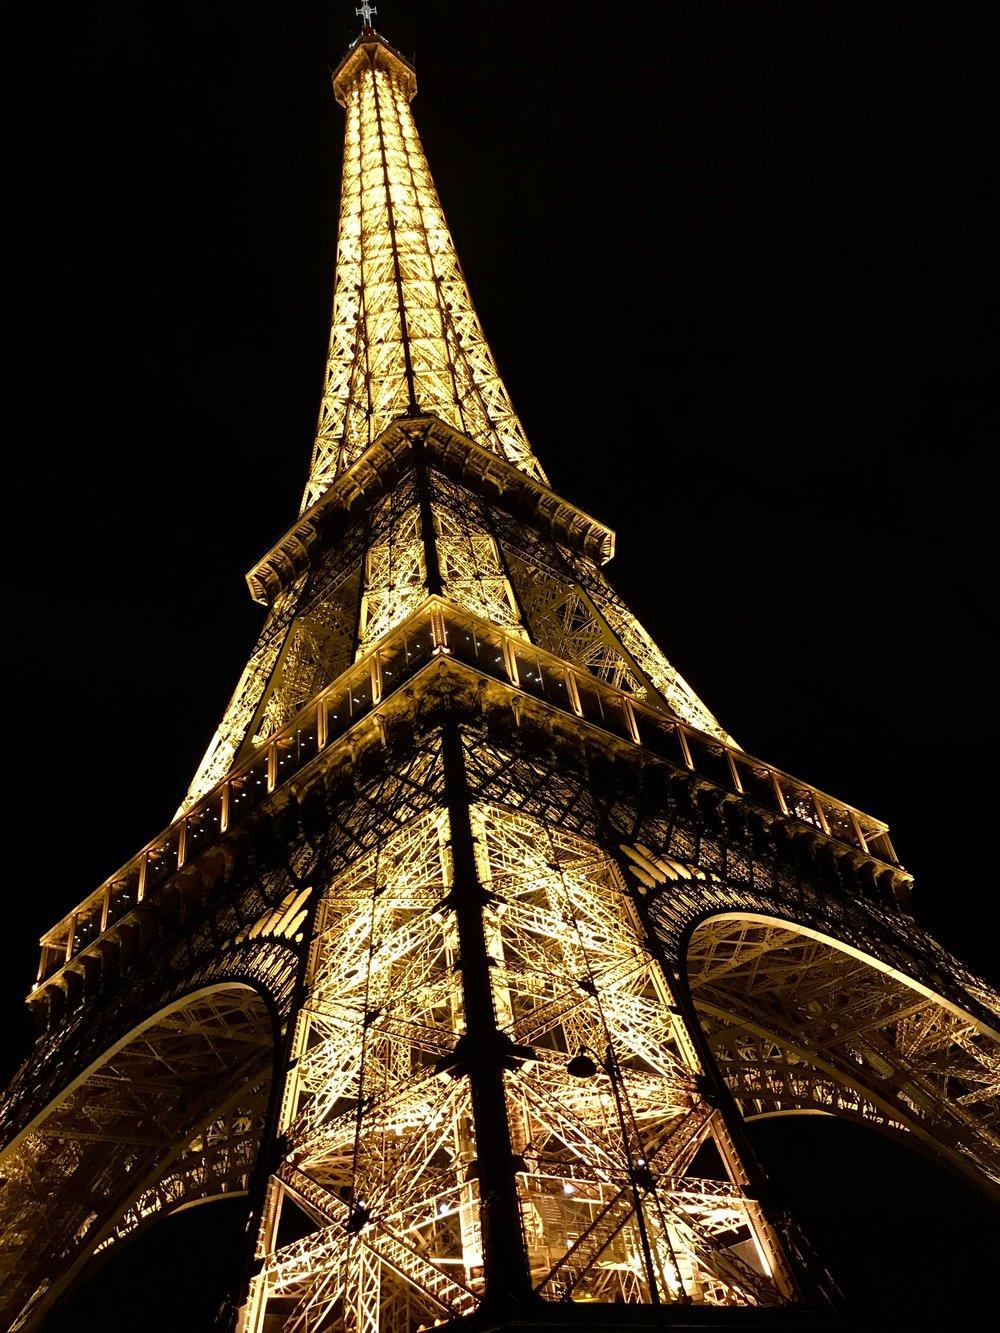 Eiffel Tower, photo taken September 2017.